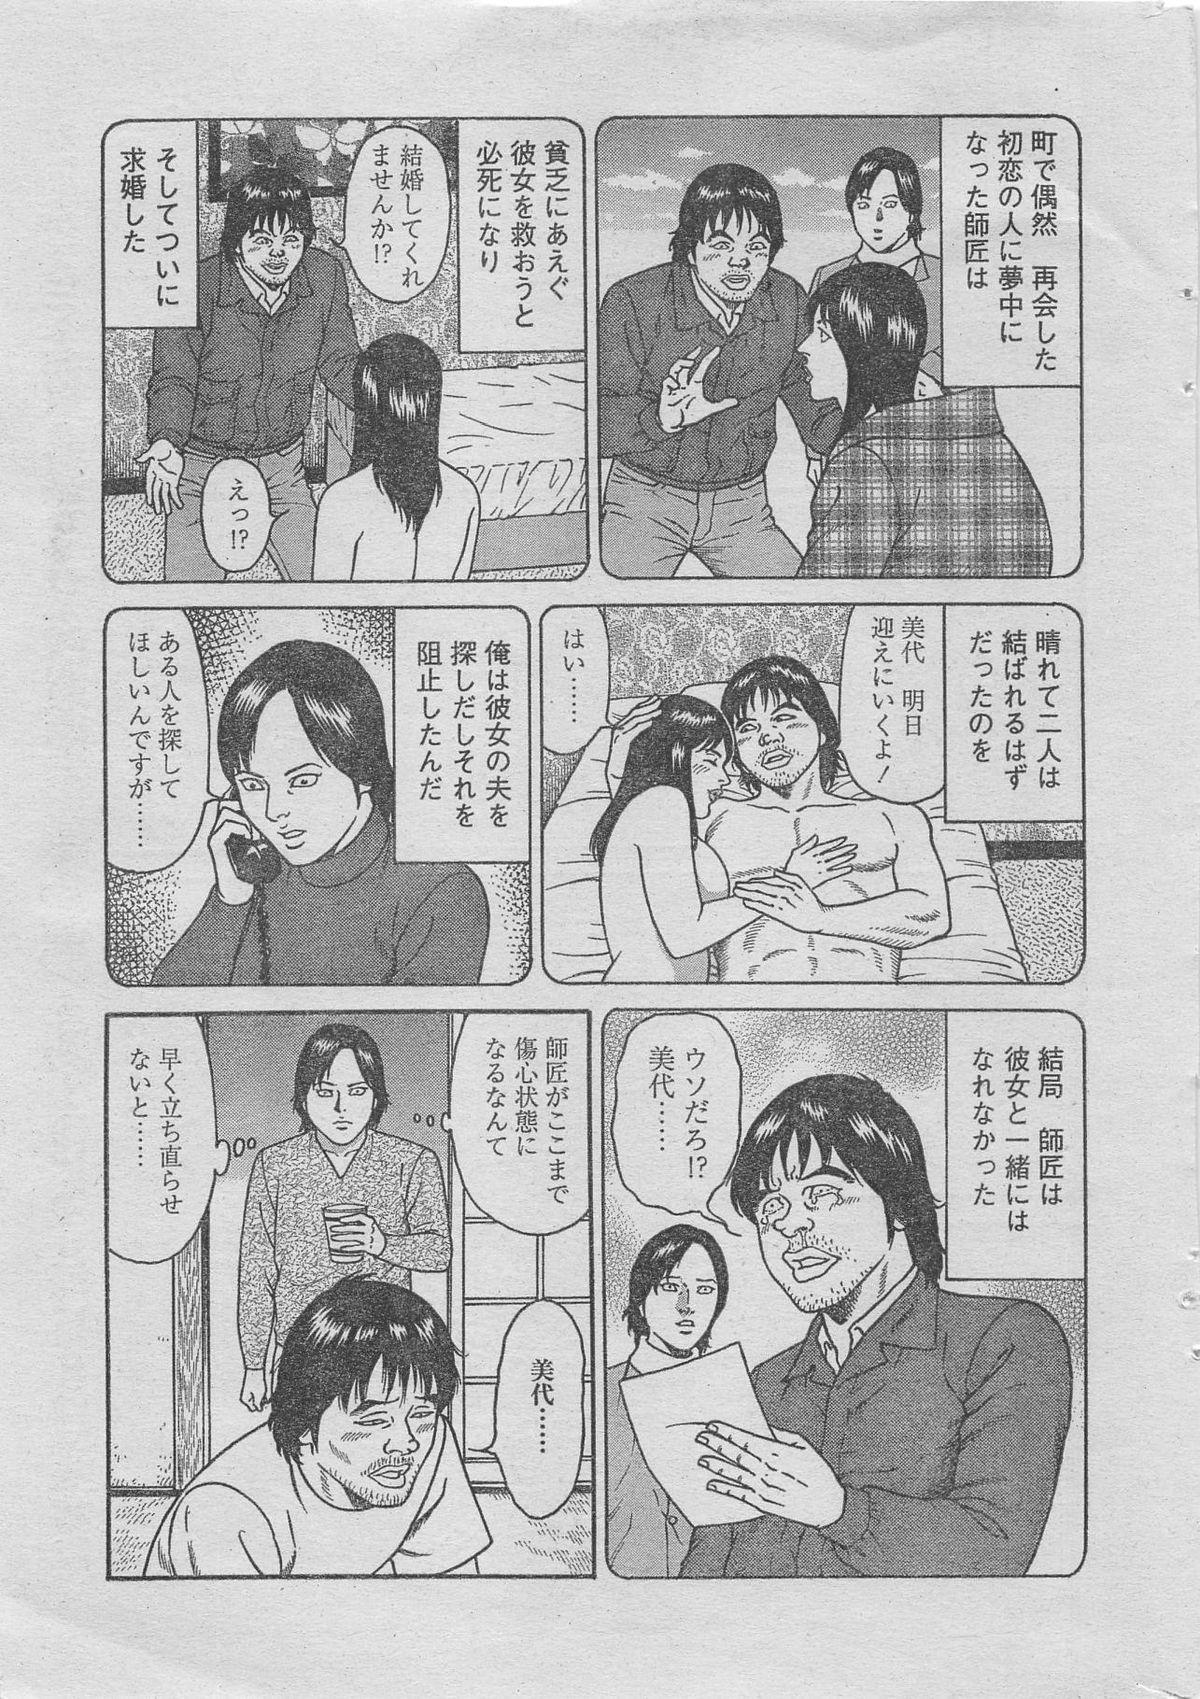 Manga Lawrence 2013-04 8